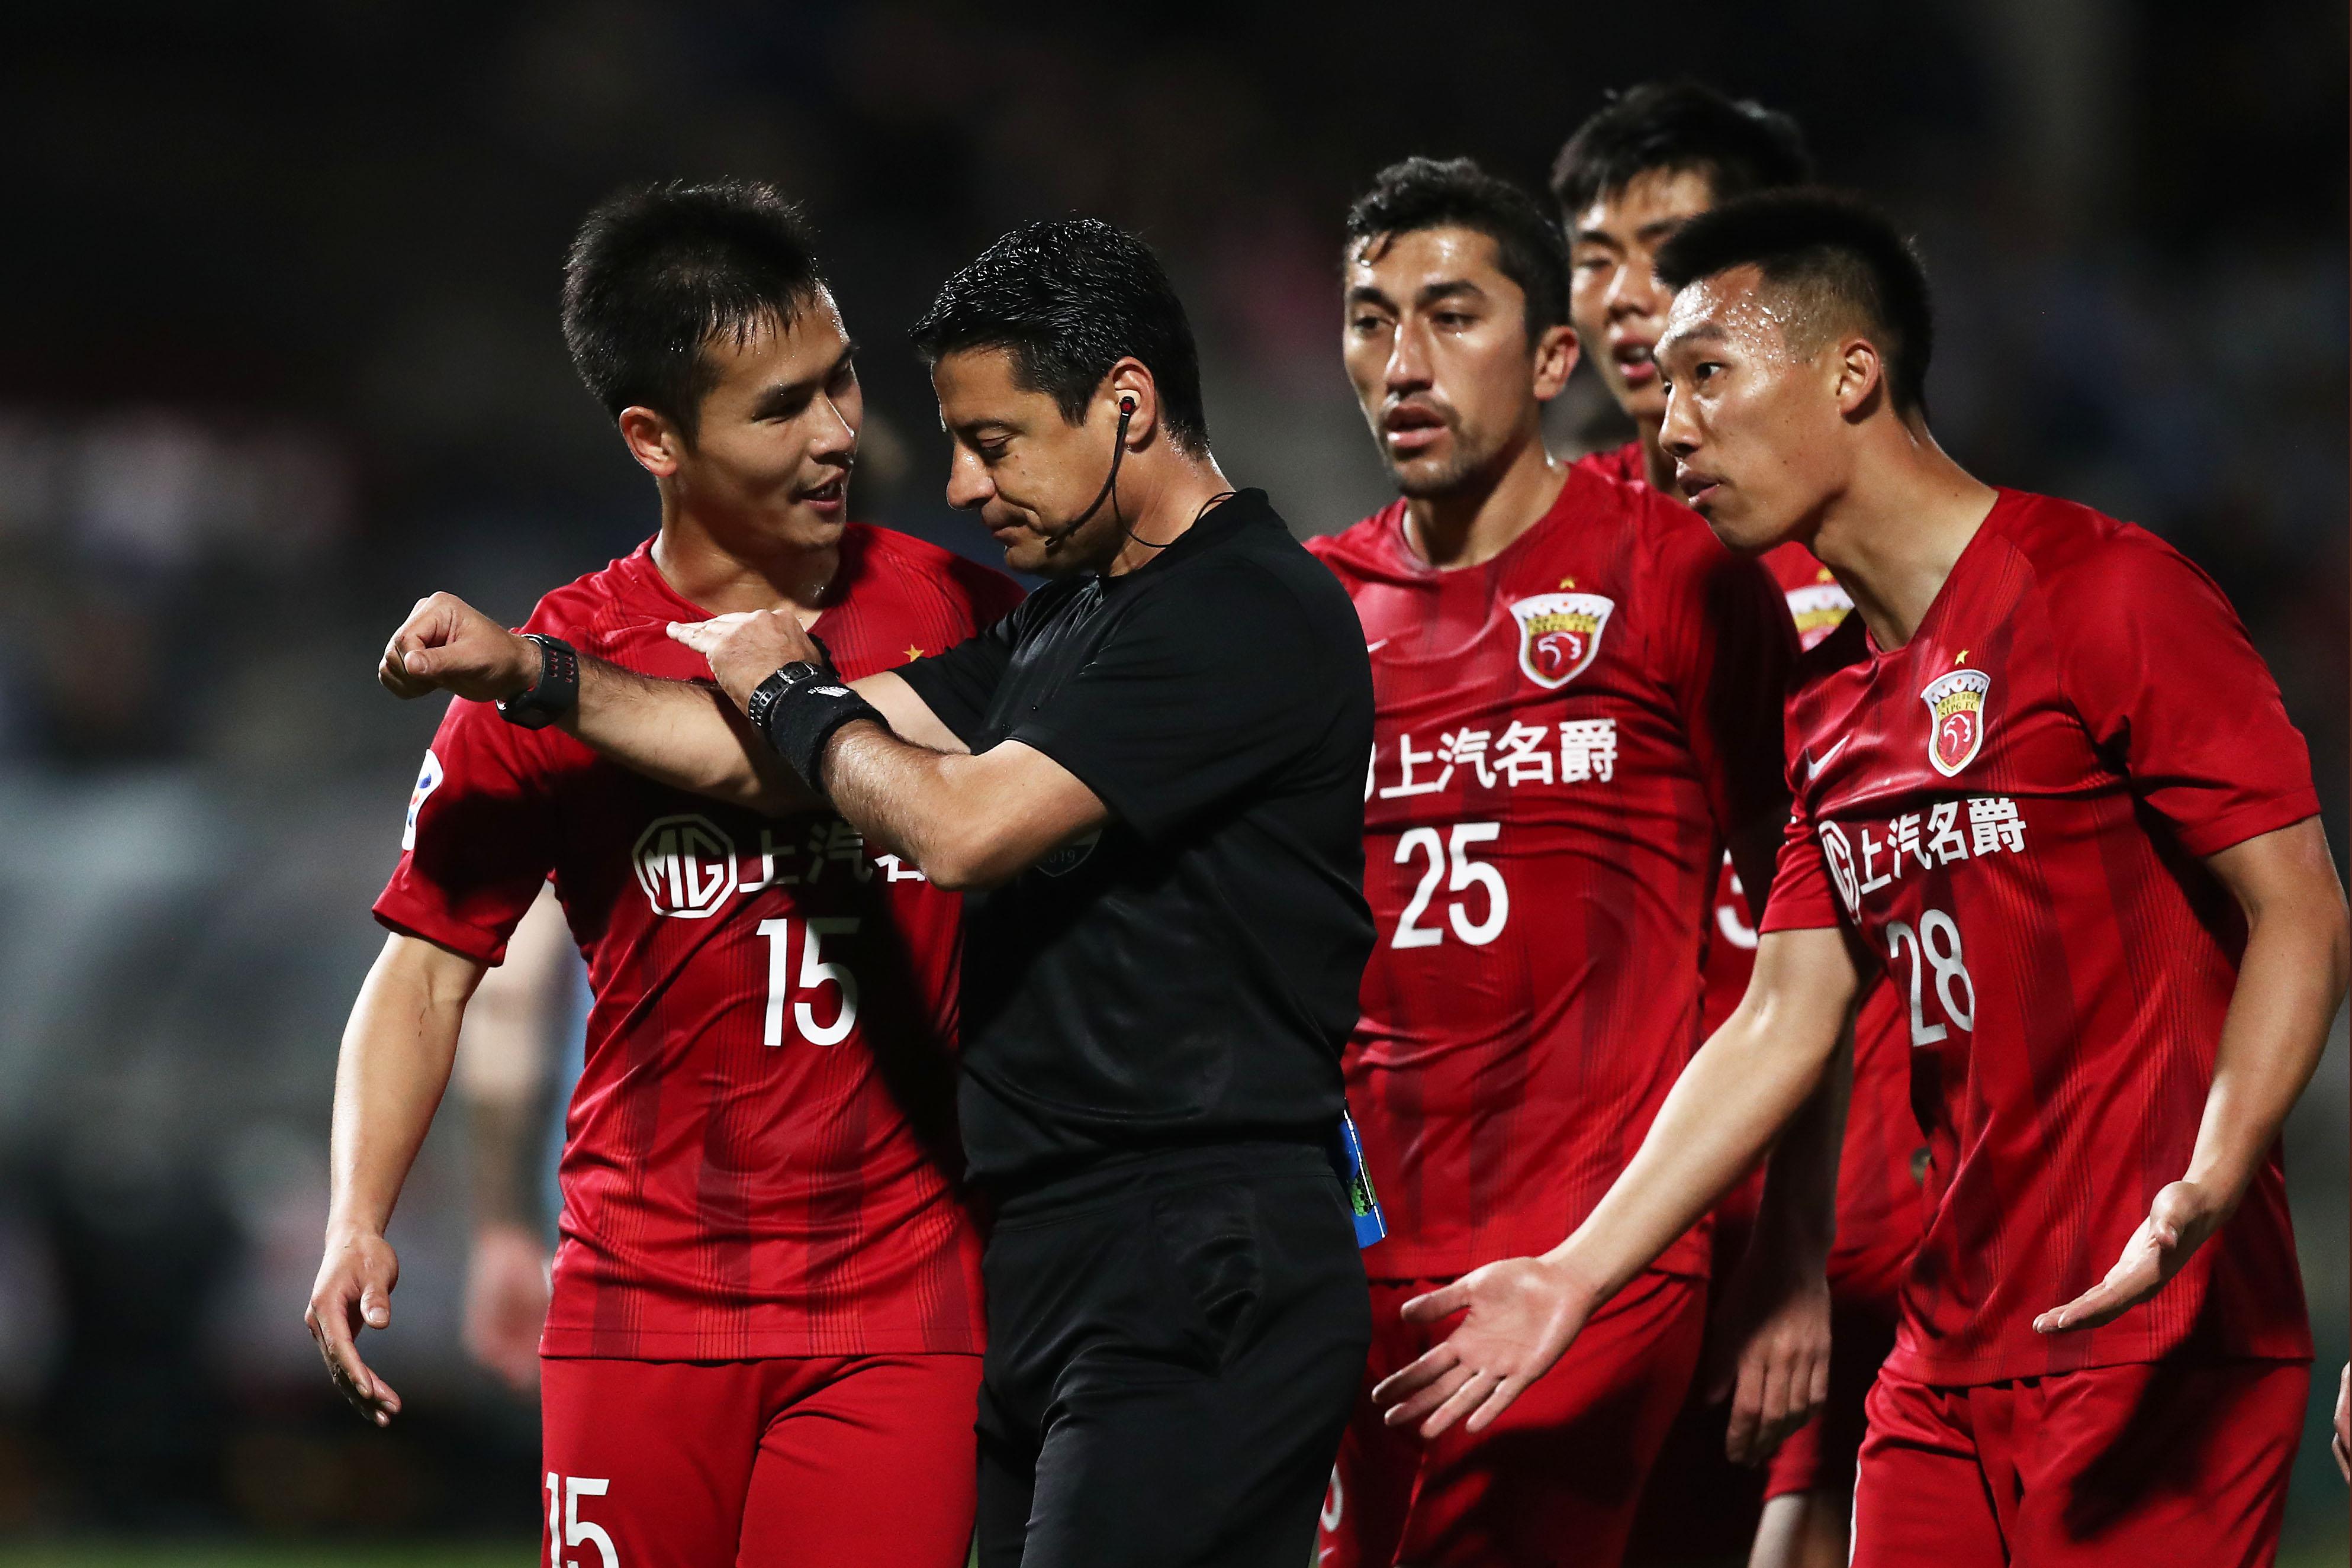 AFC Champions League: Group Stage - Sydney FC v Shanghai SIPG